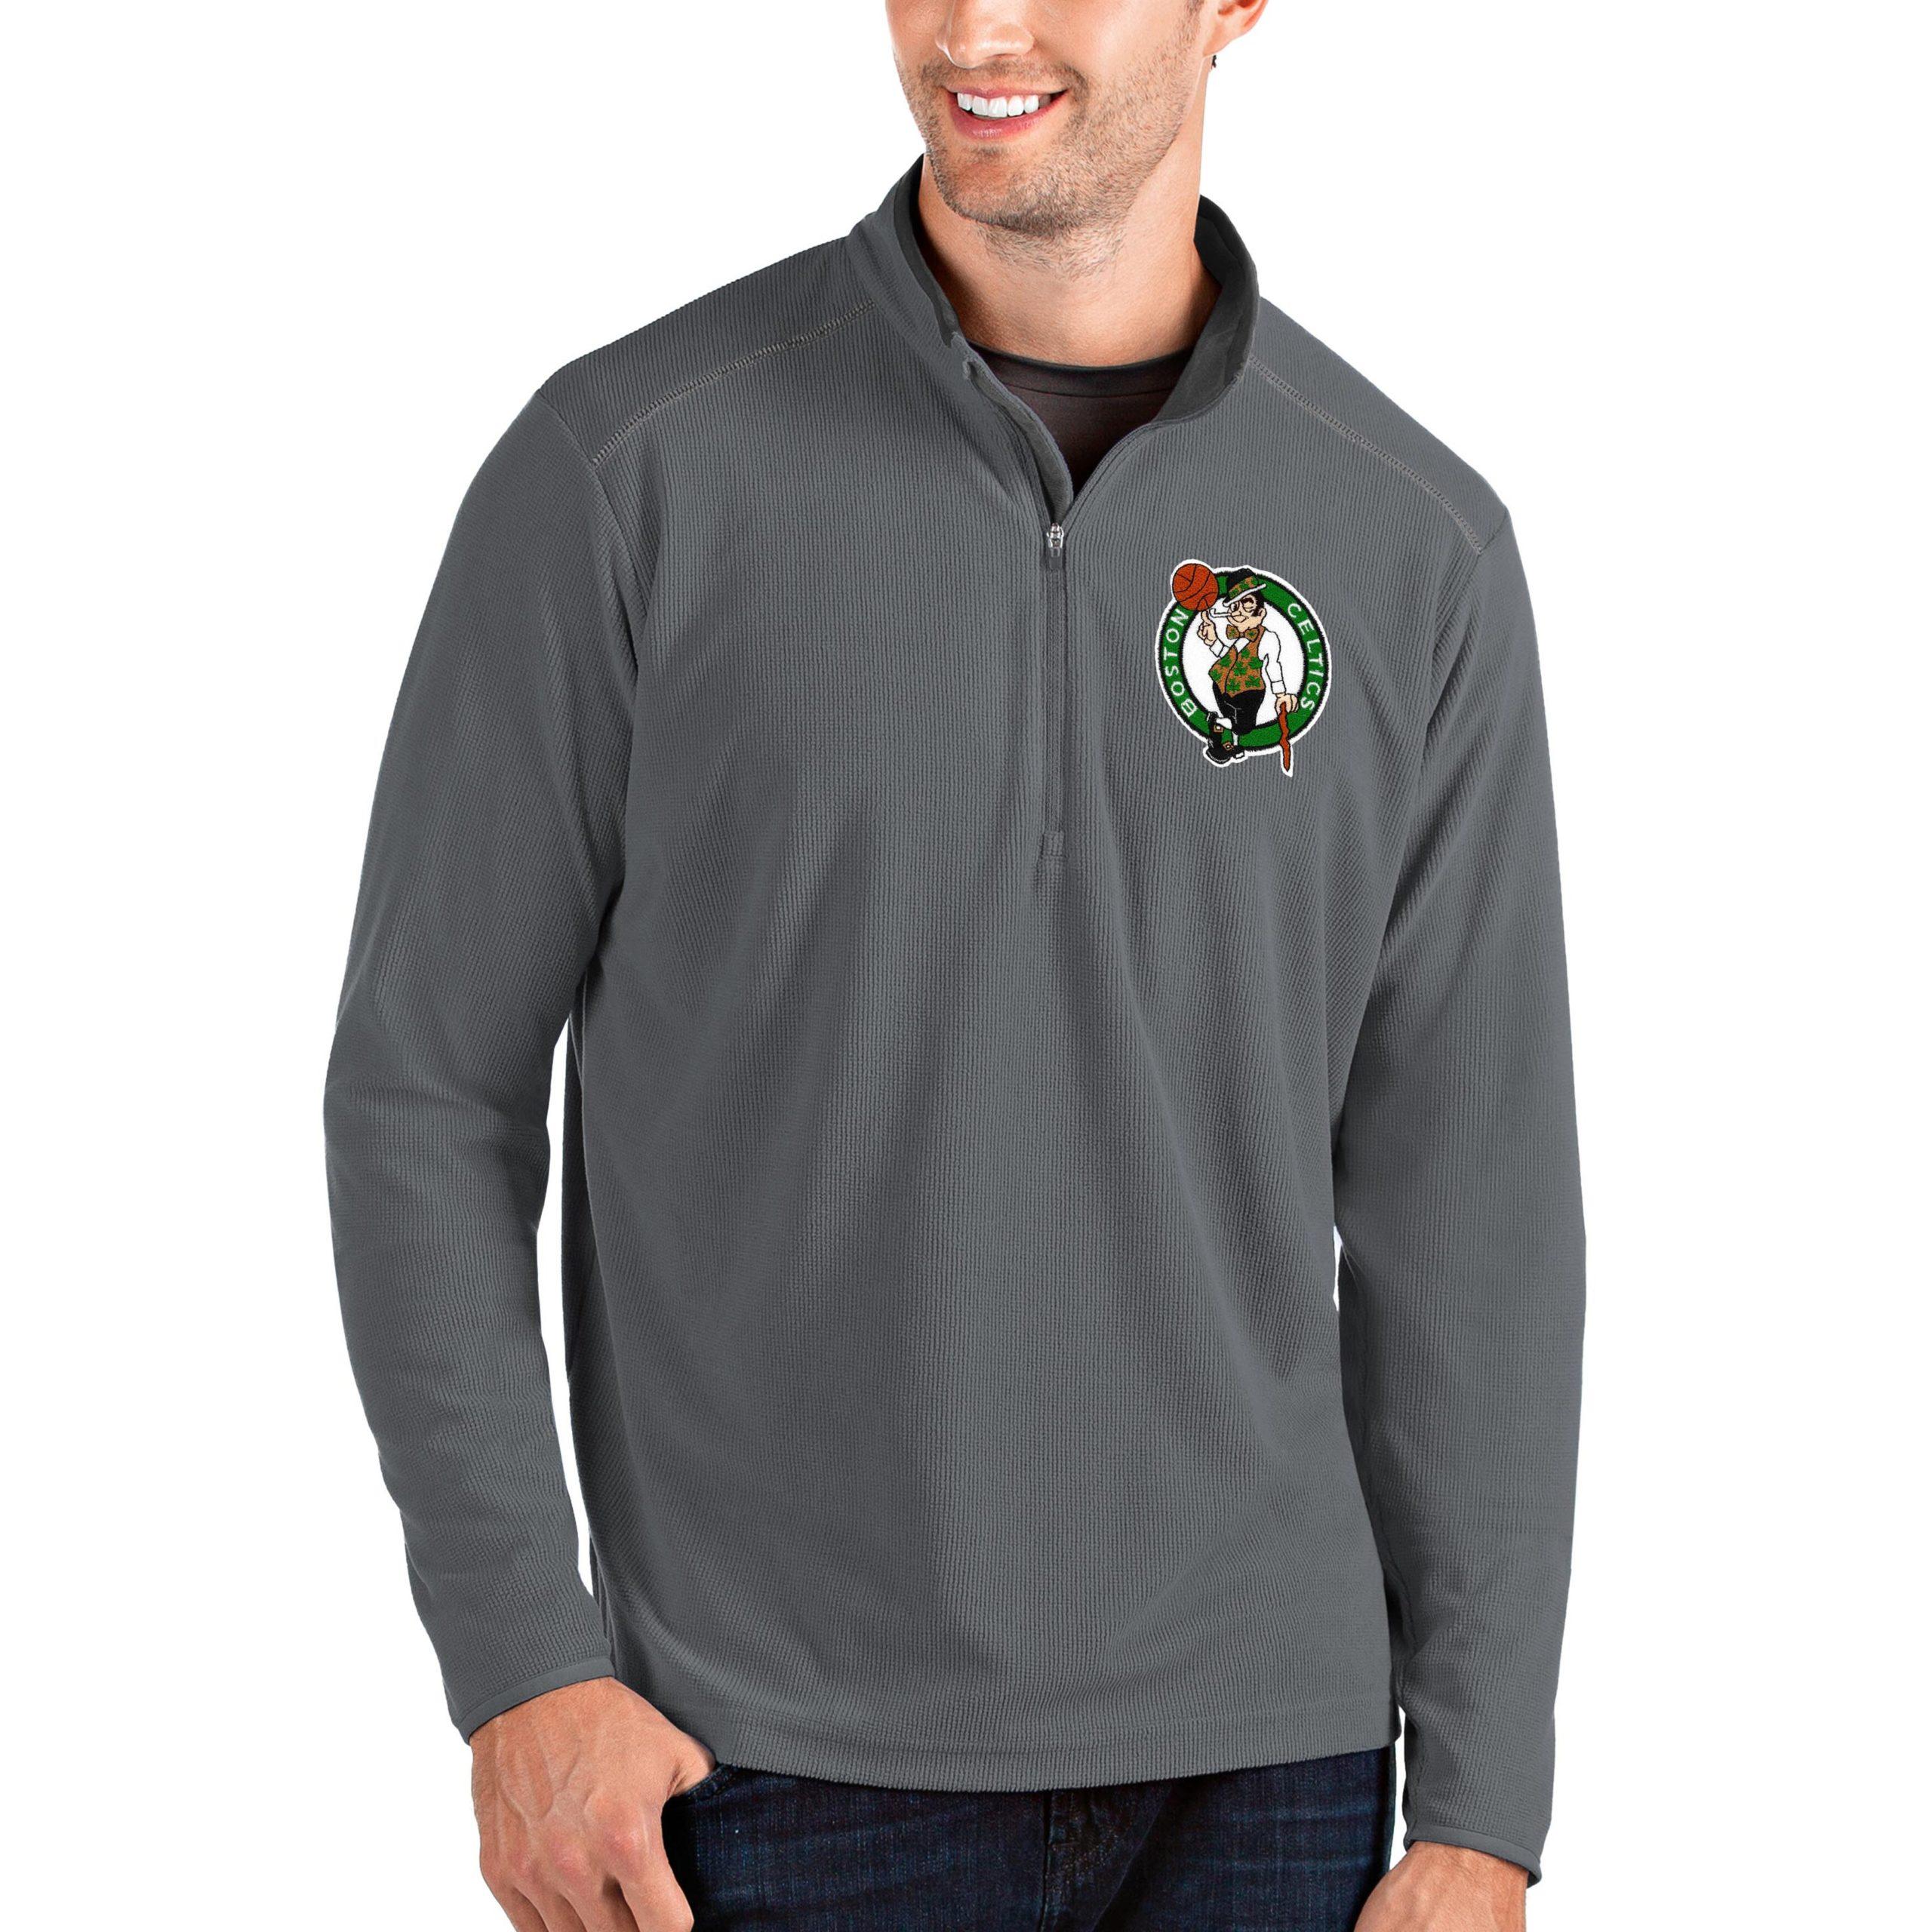 Boston Celtics Antigua Big & Tall Glacier Quarter-Zip Pullover Jacket - Gray/Gray